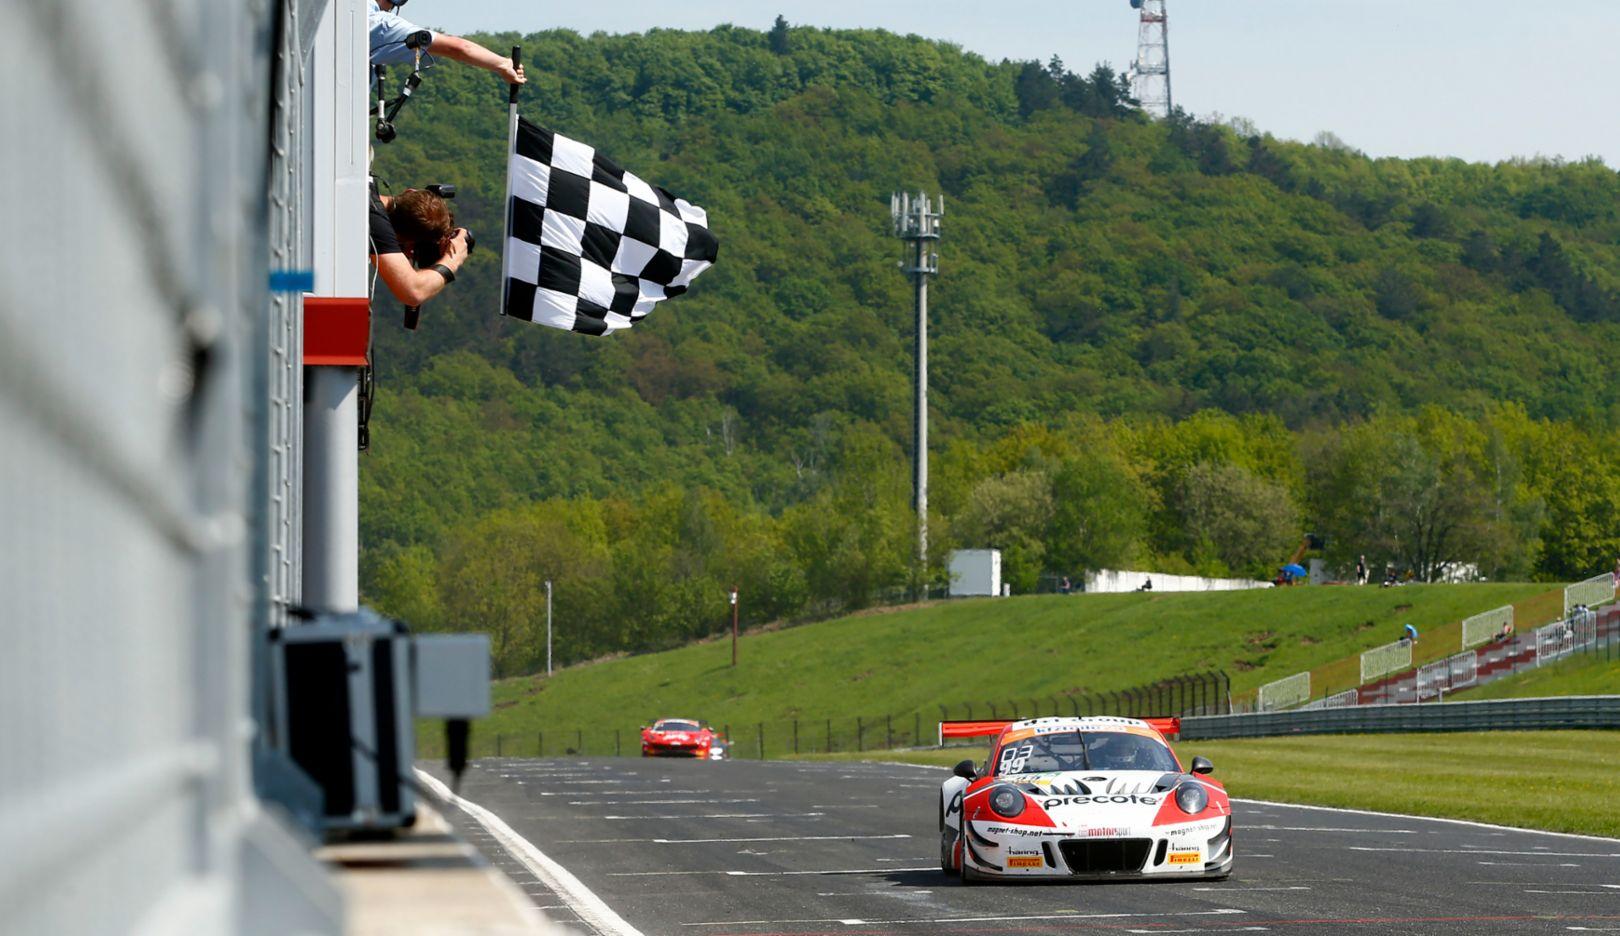 911 GT3 R, Precote Herberth Motorsport, ADAC GT Masters, Most, 2018, Porsche AG